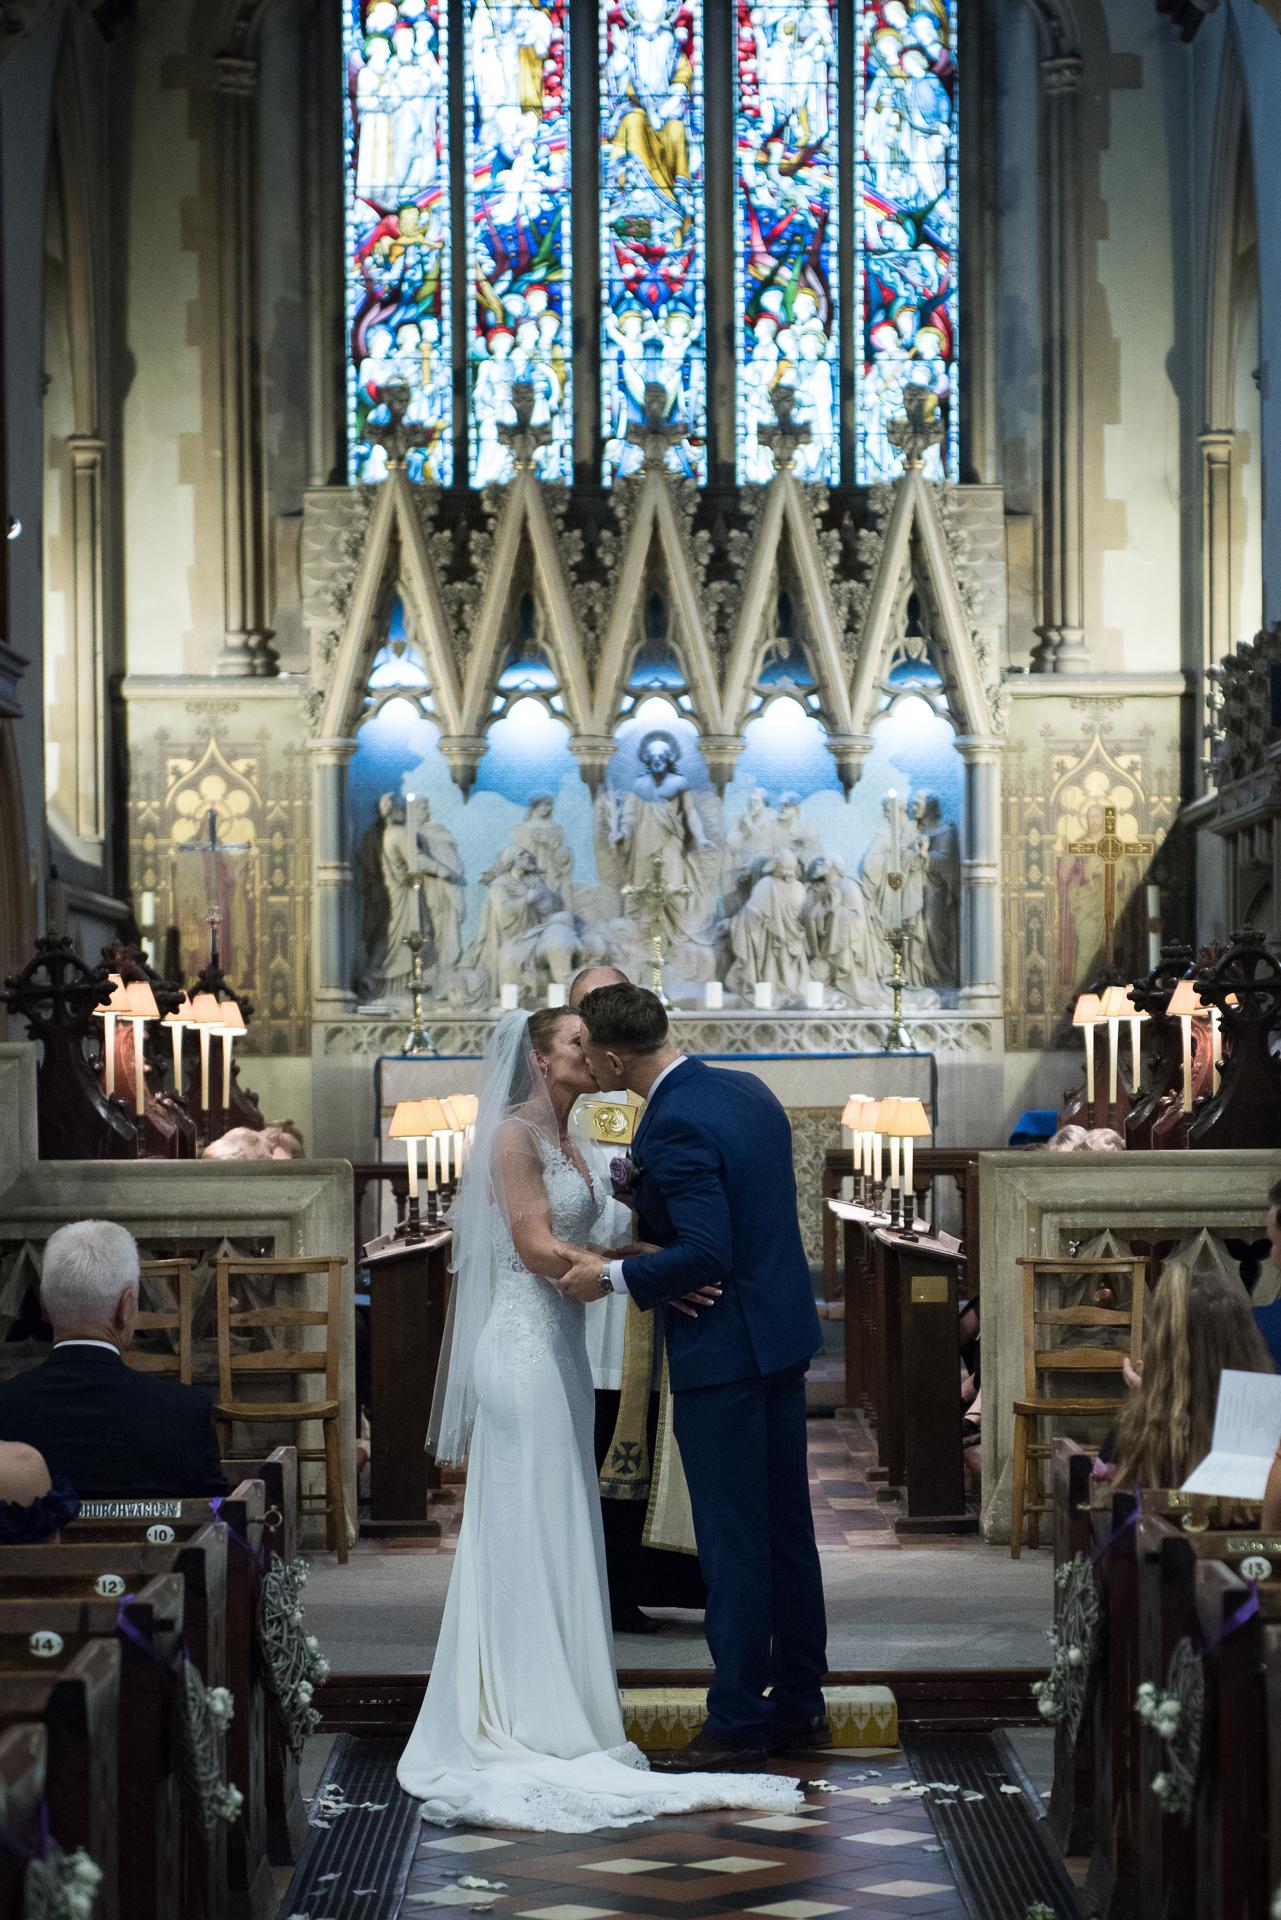 Ufton Court Wedding Photography09.JPG